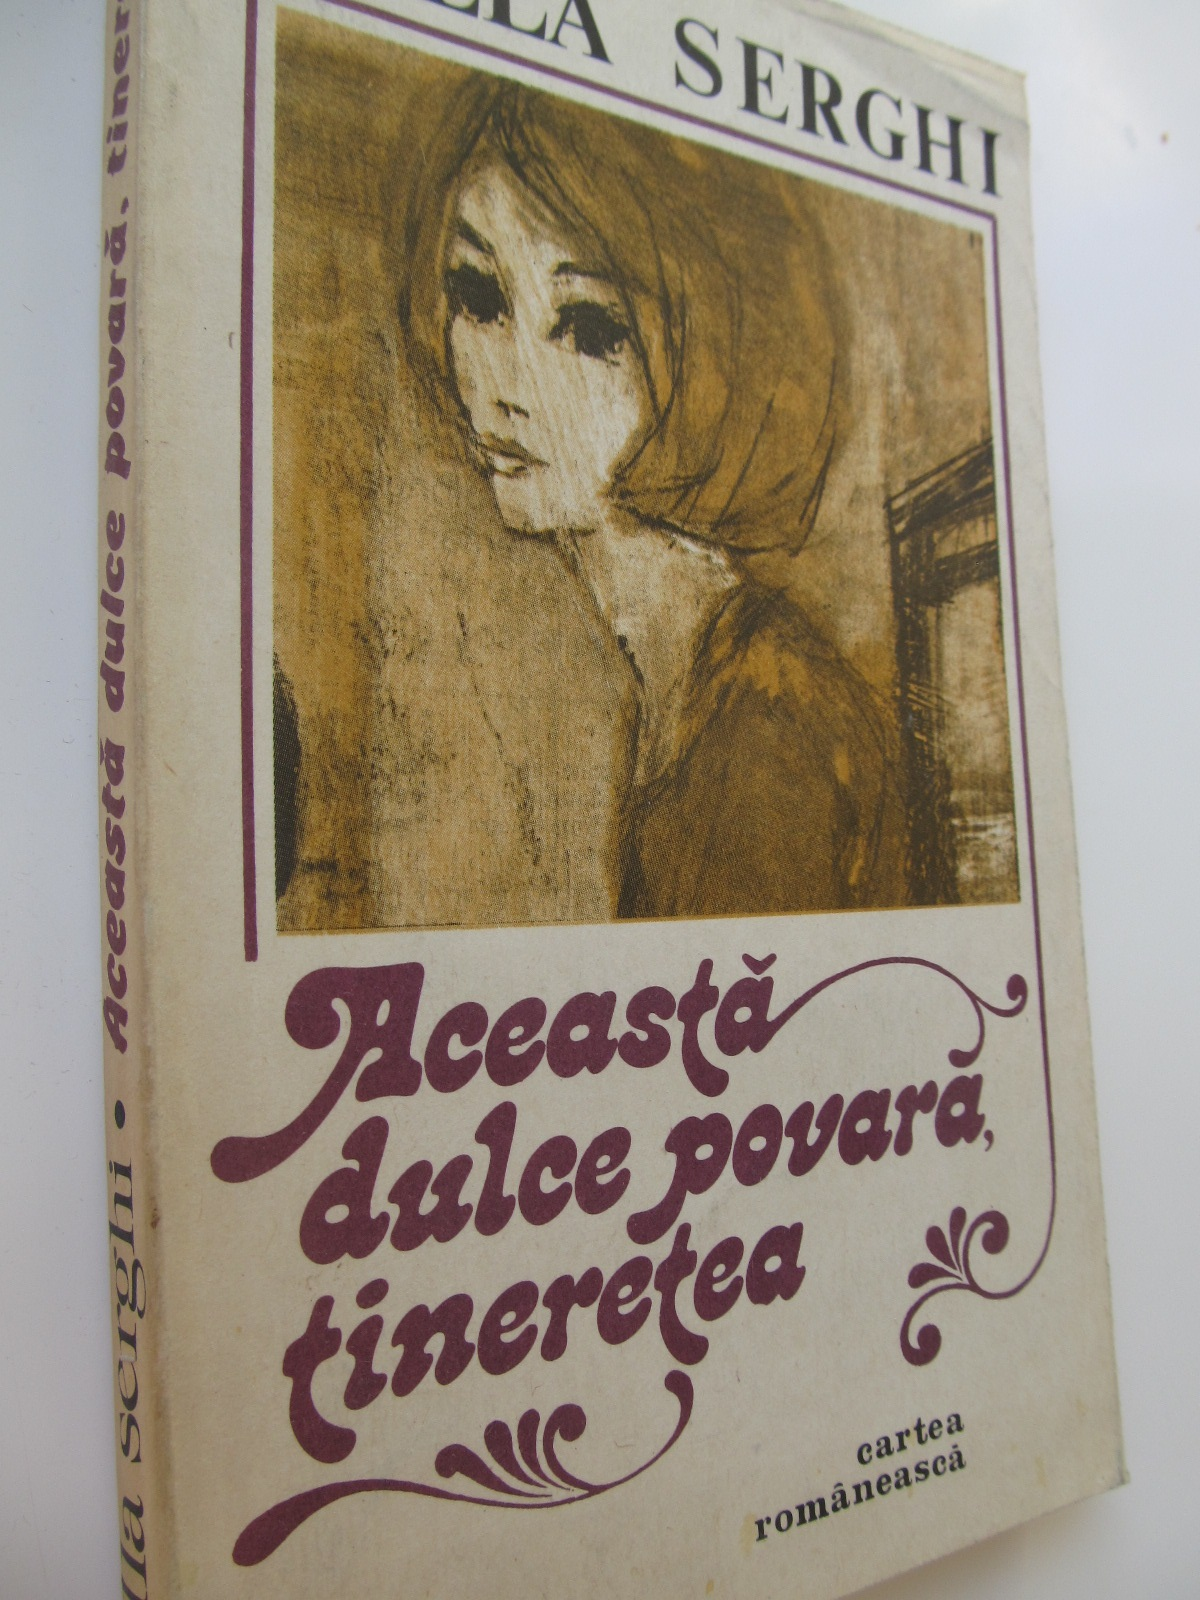 Aceasta dulce povara tineretea - Cella Serghi | Detalii carte